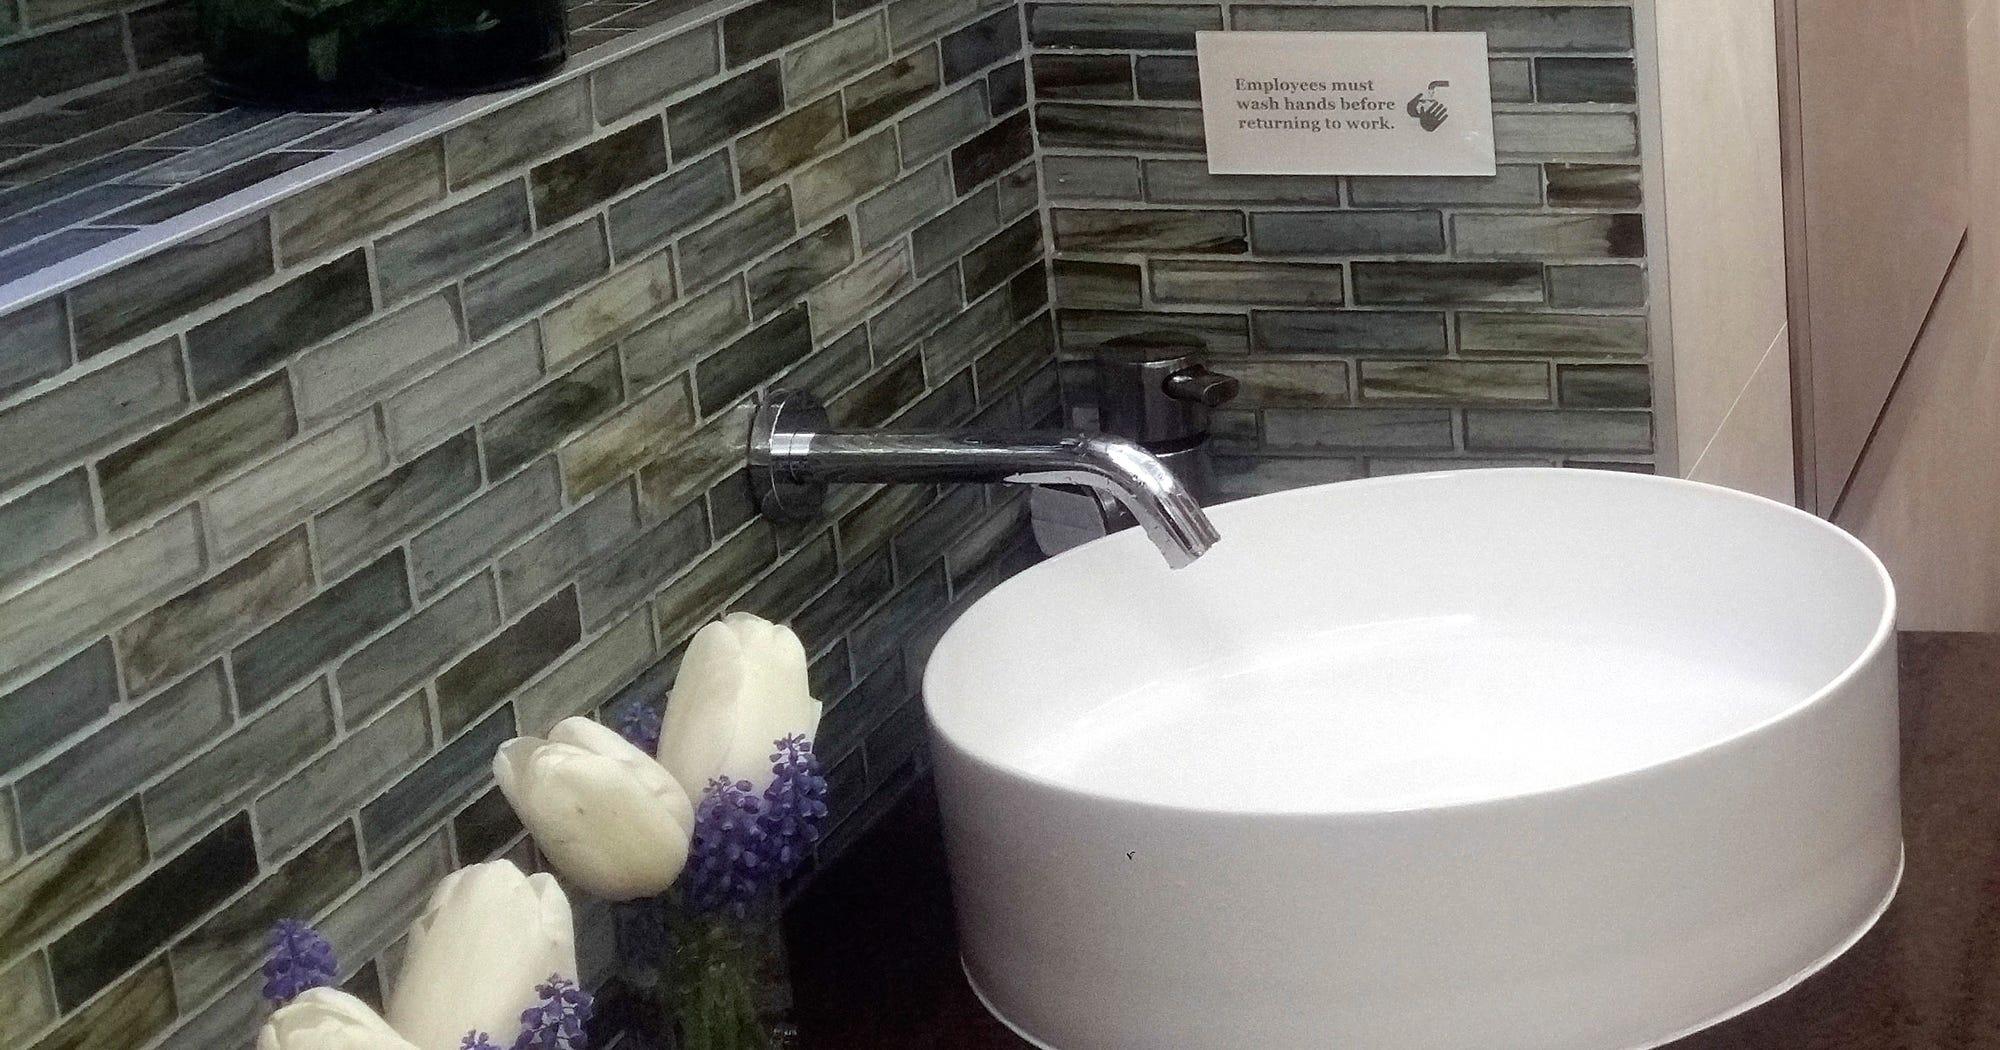 Fancy Public Bathroom Opens New York City Library